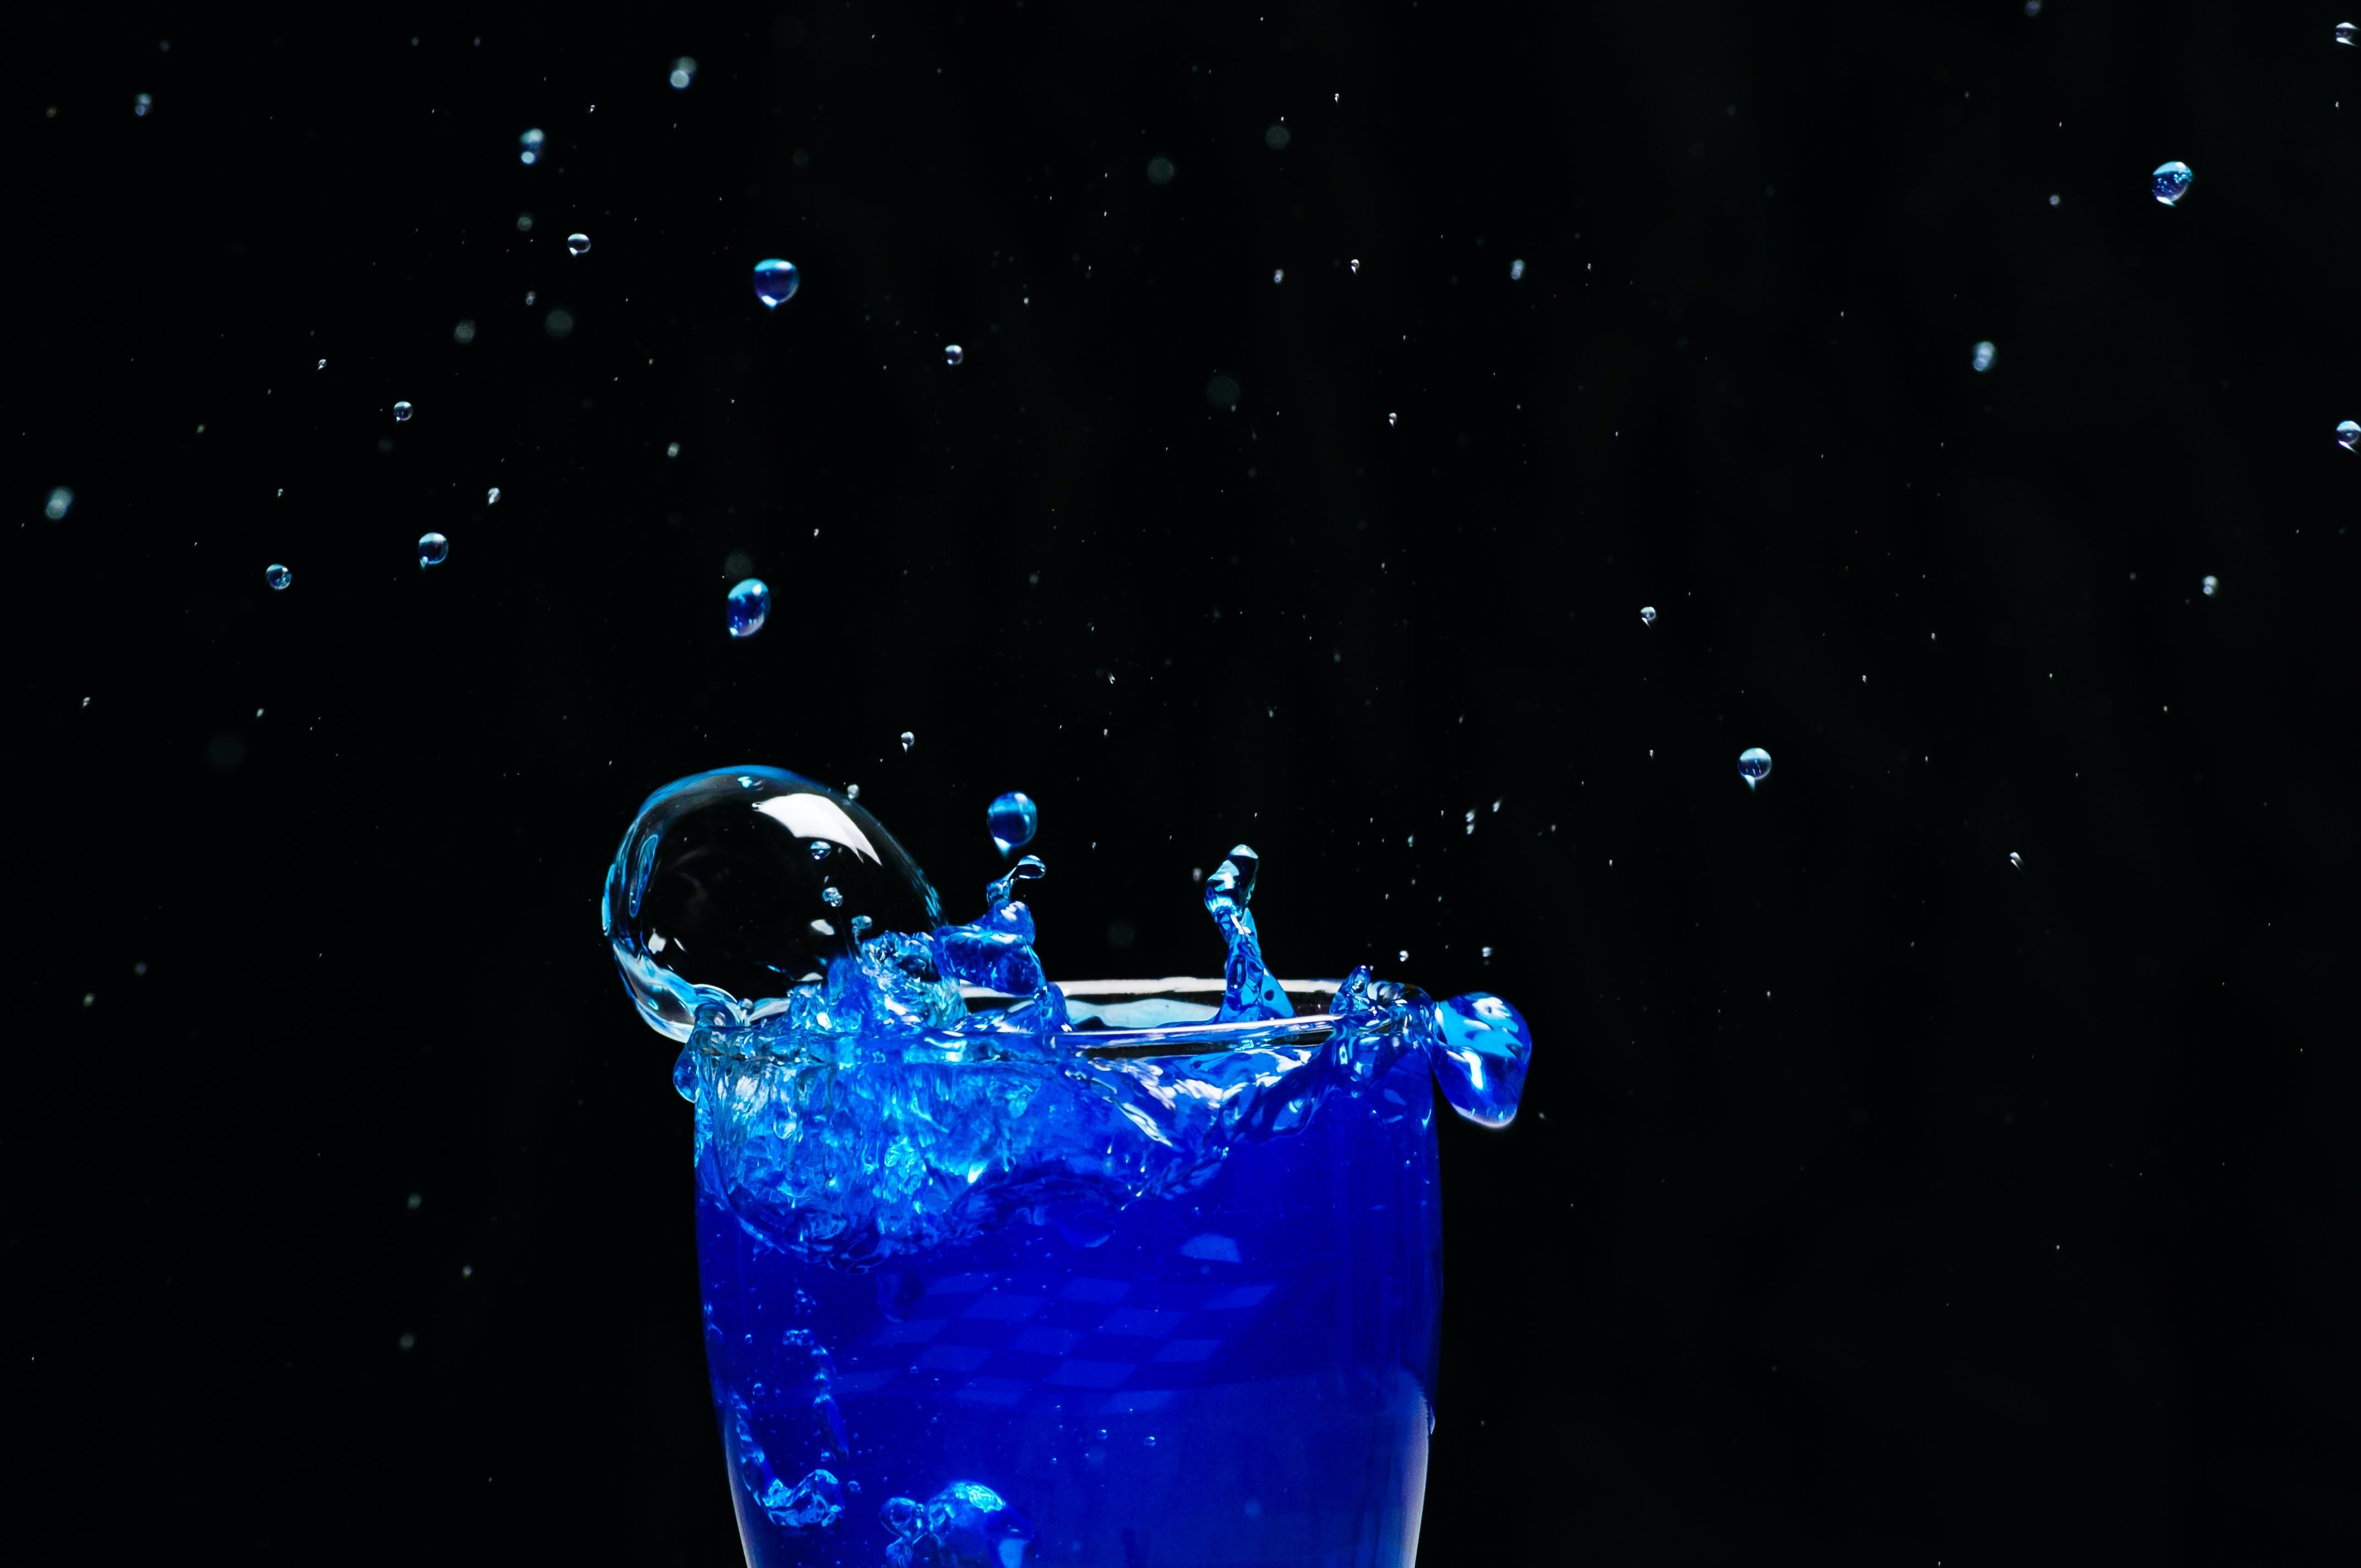 Blue Liquid Splash on Glass